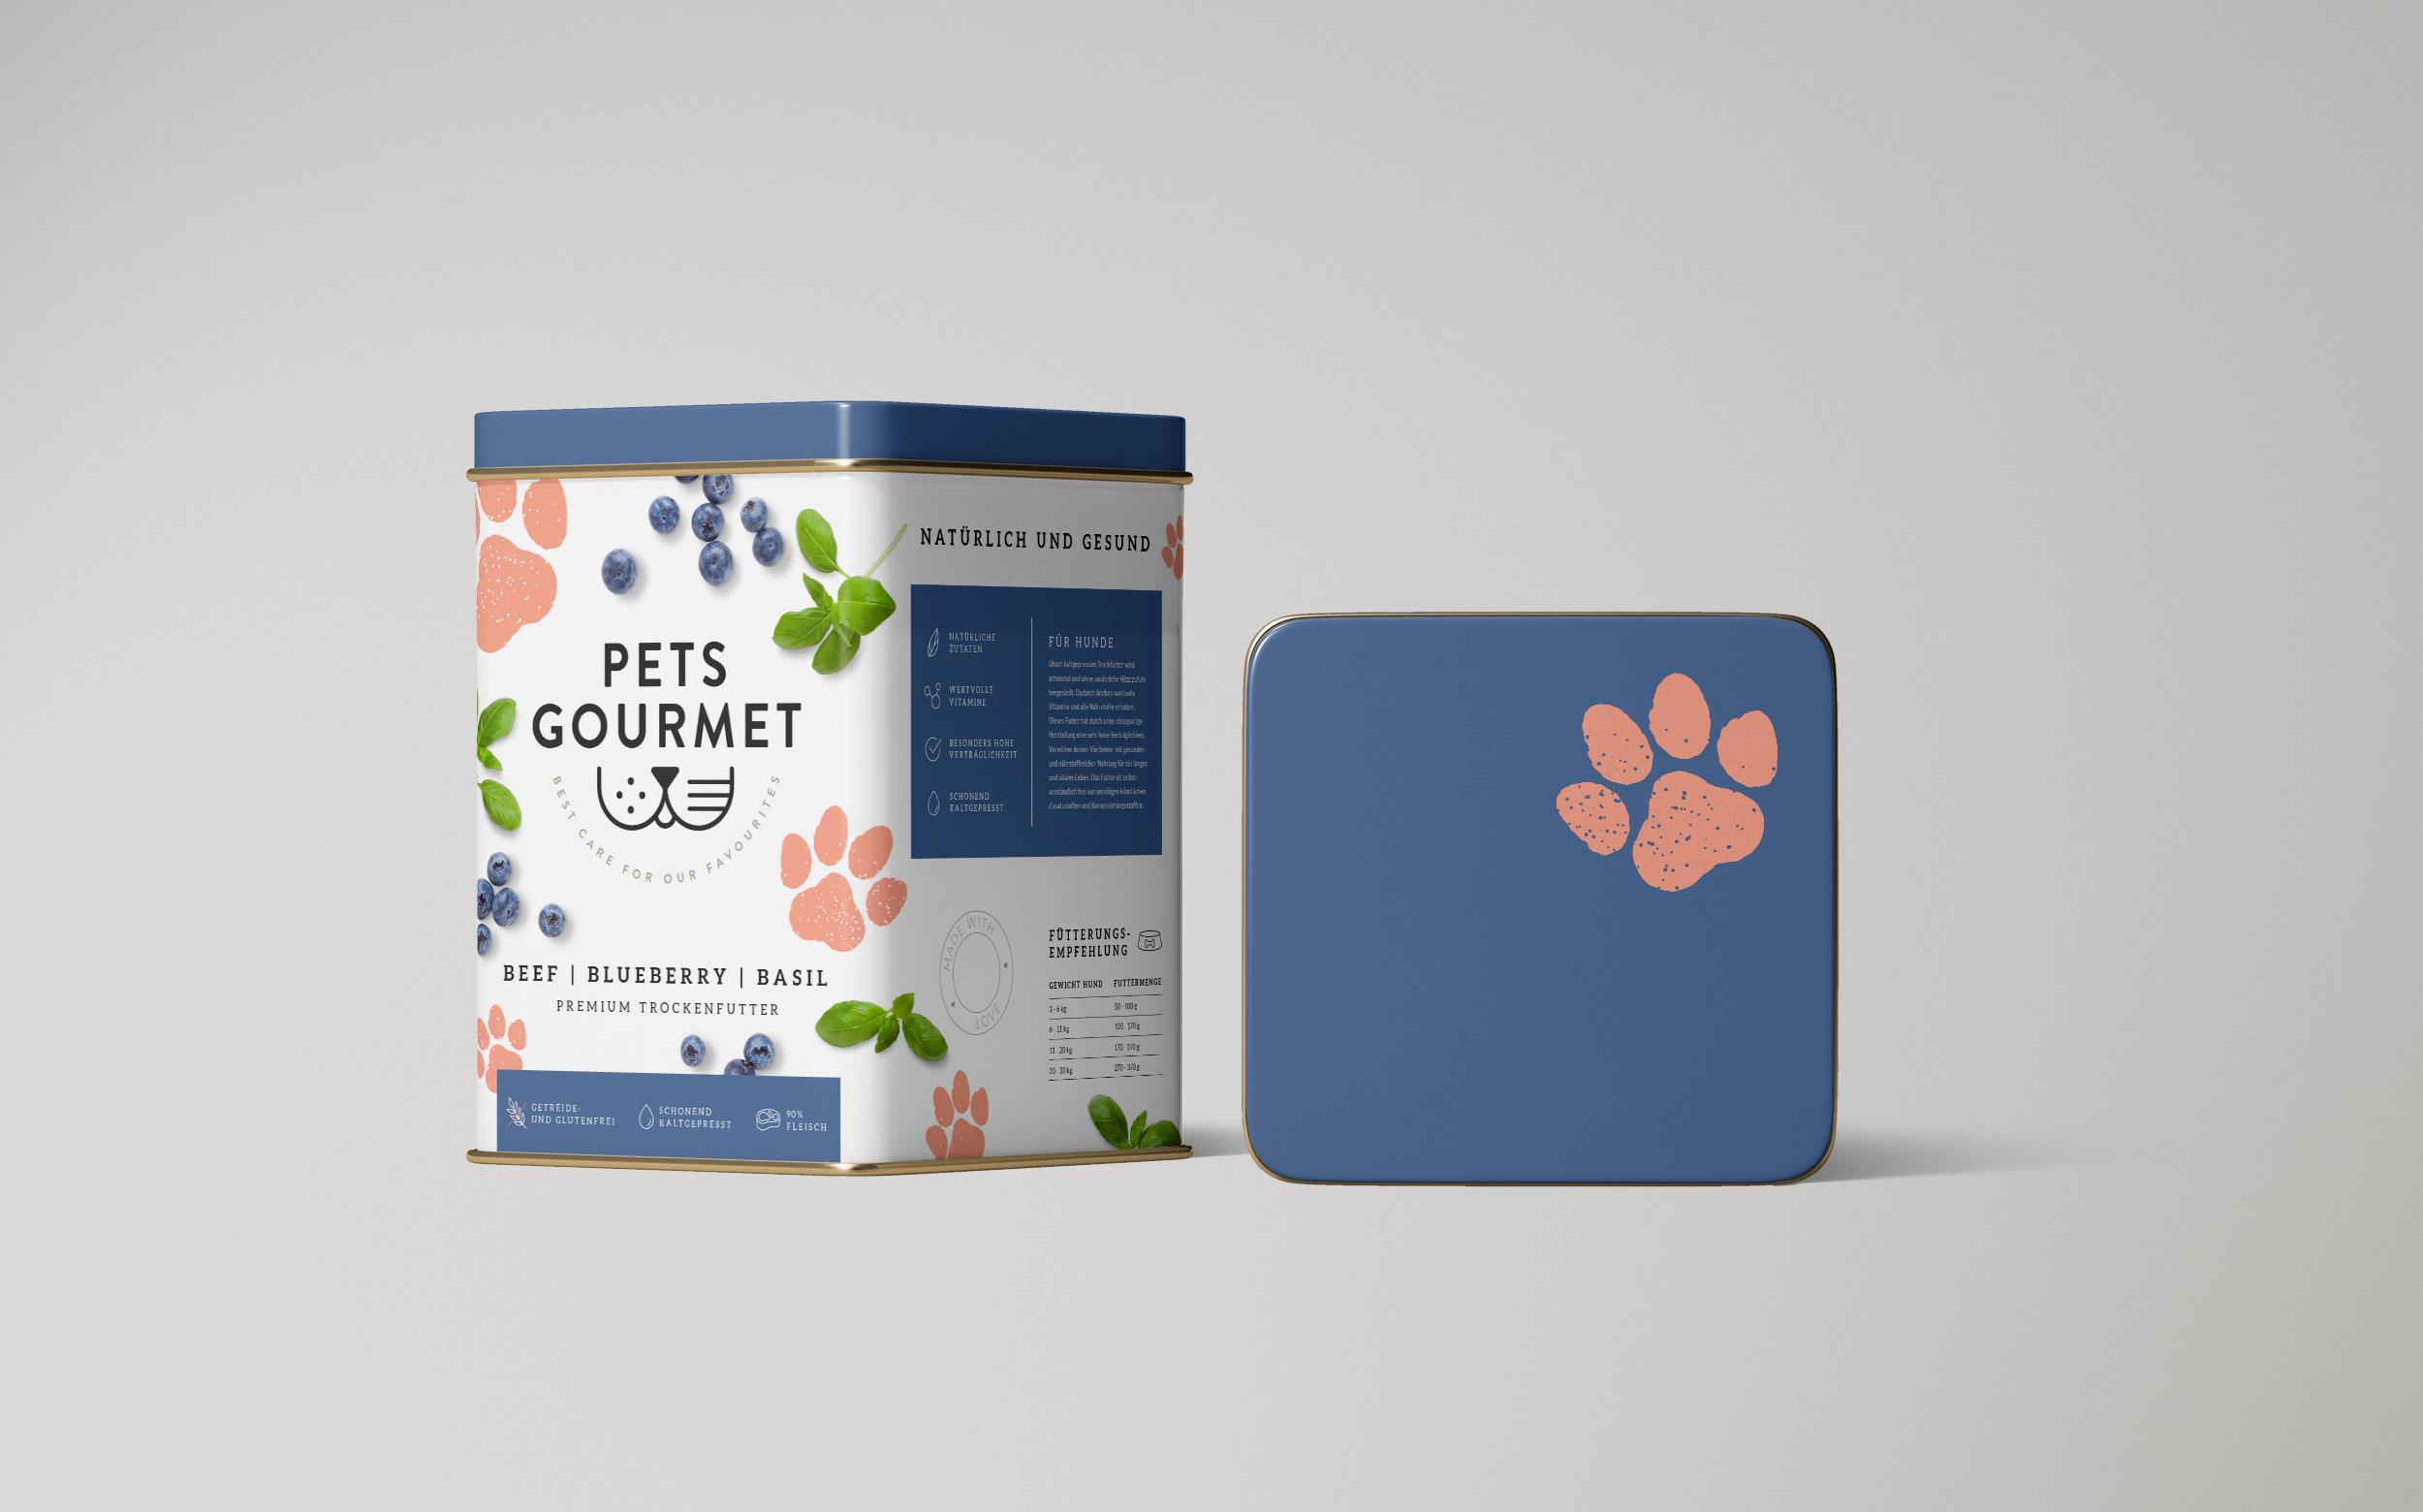 Pets_Gourmet_04